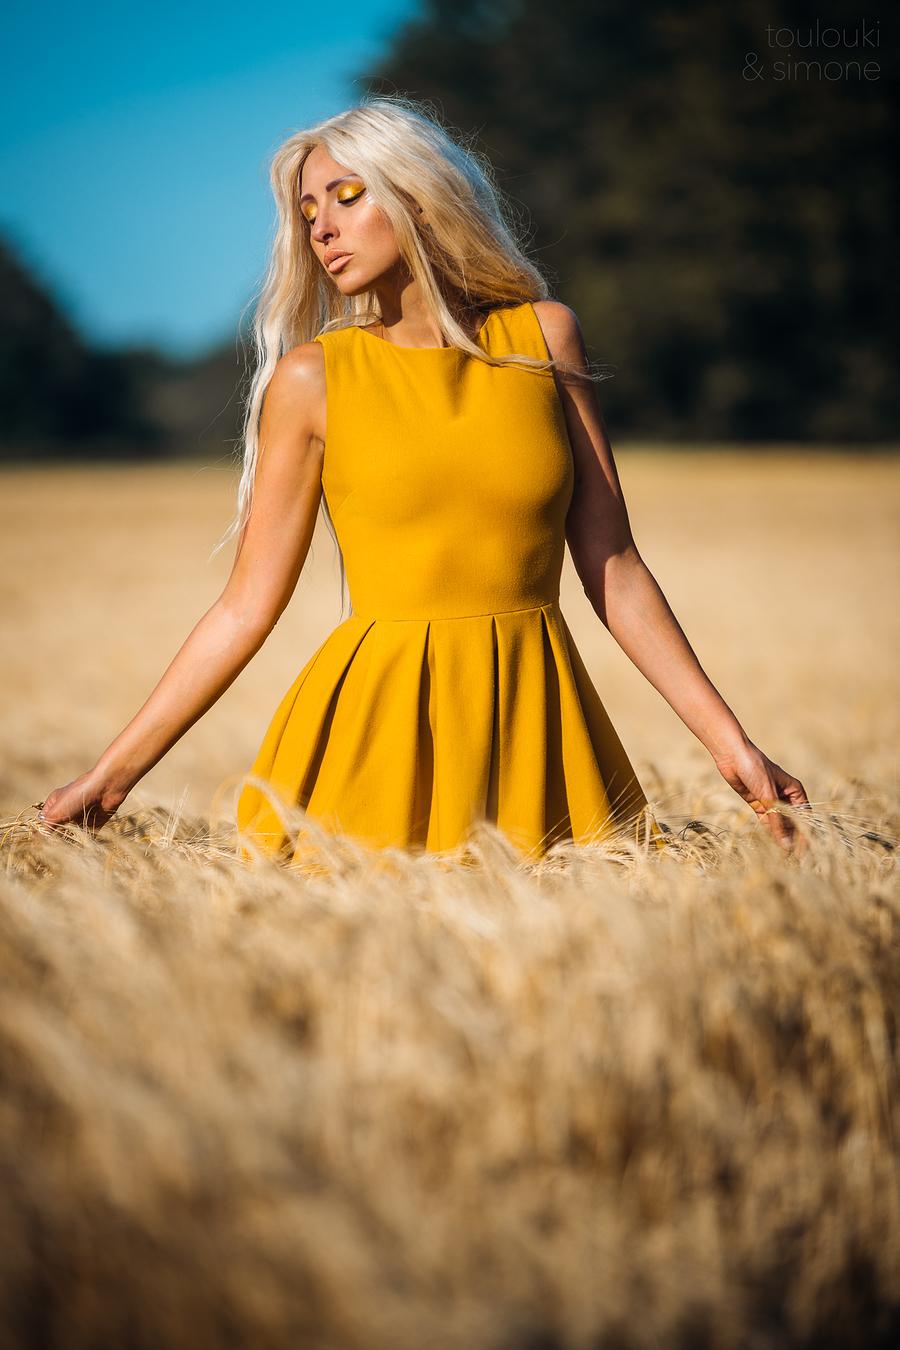 Missing summer / Photography by Simone Orsini, Model ❀ Chiara Elisabetta, Makeup by ❀ Chiara Elisabetta / Uploaded 17th November 2019 @ 11:30 AM